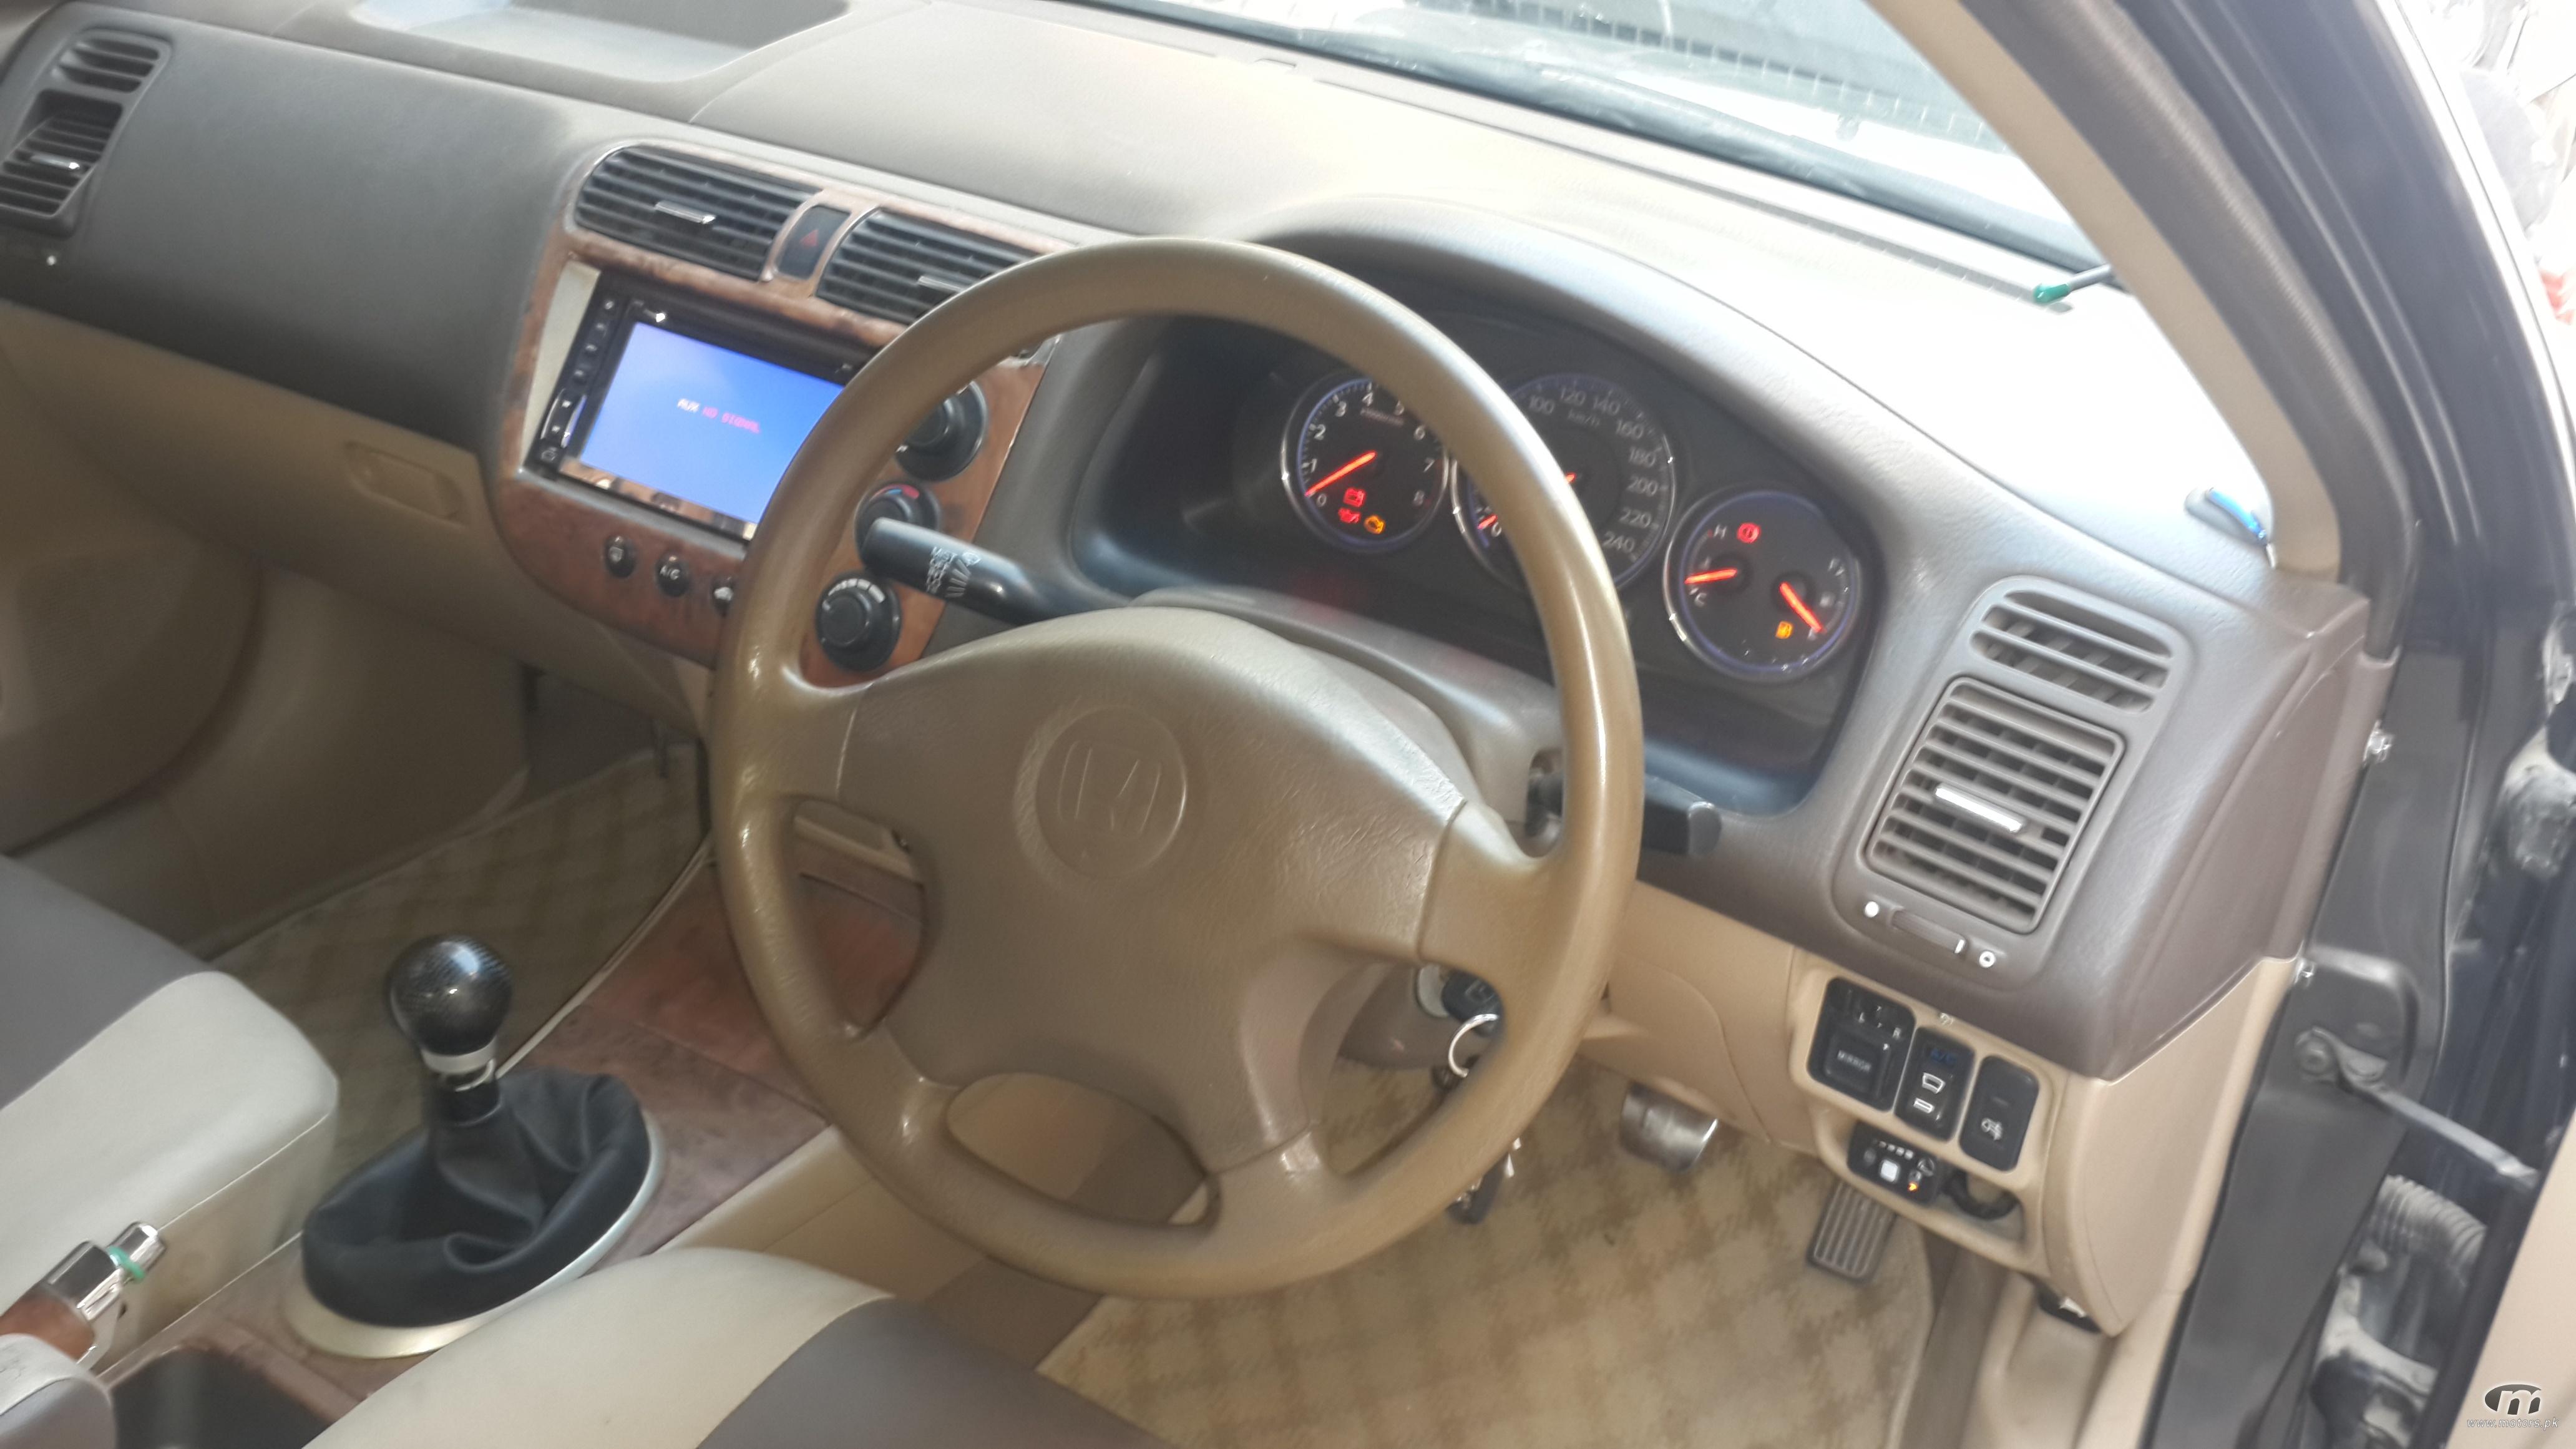 Used Honda Civic 2004 For Sale In Karachi Ad 7980 Motors Pk